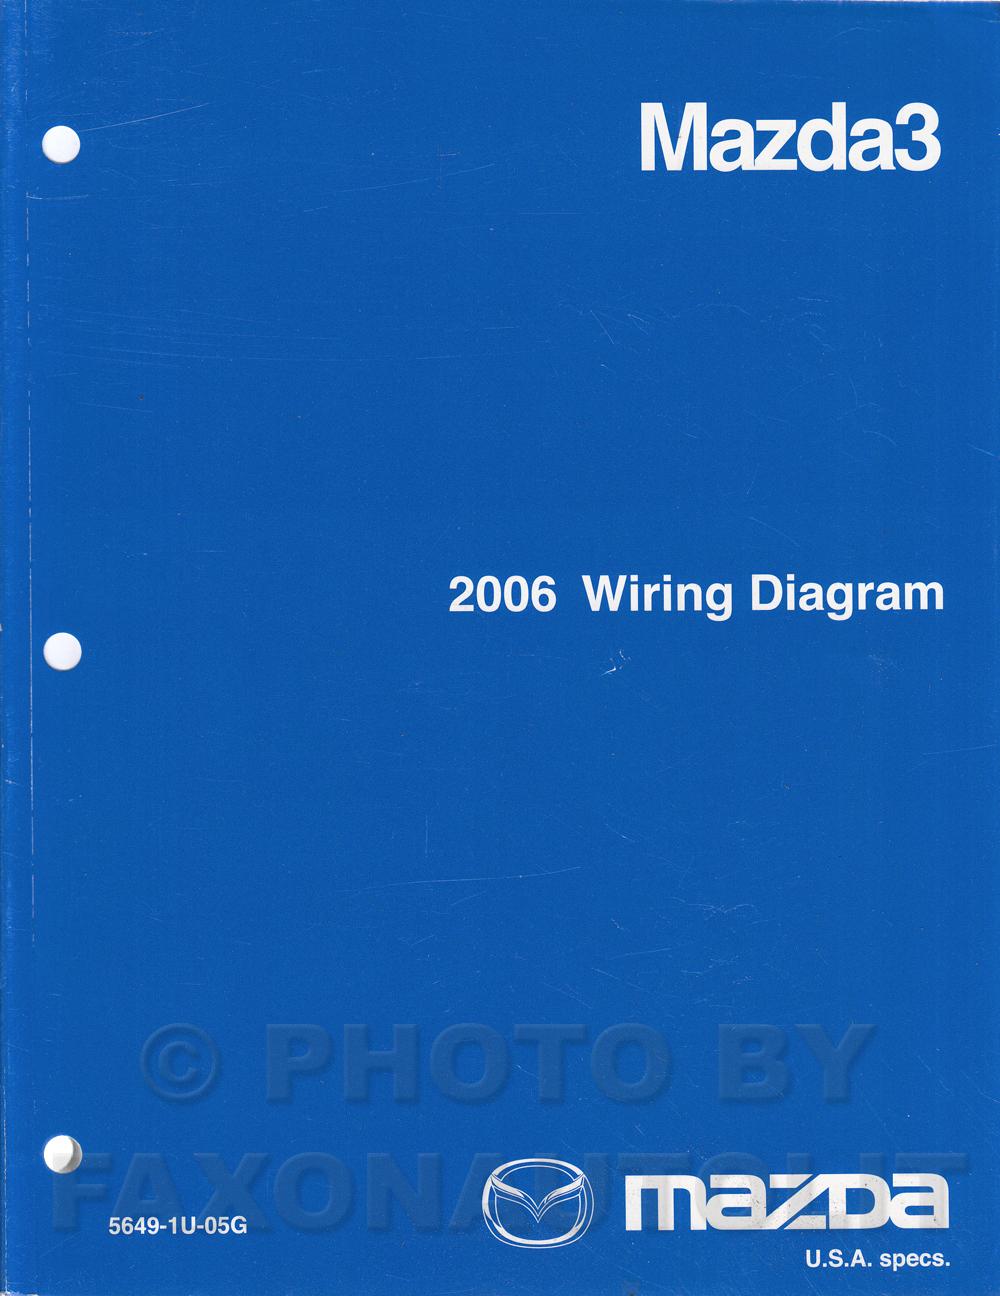 hight resolution of 2006 mazda 3 wiring diagram original mazda3 2006 mazda 3 radio wiring diagram 2006 mazda 3 wiring diagrams